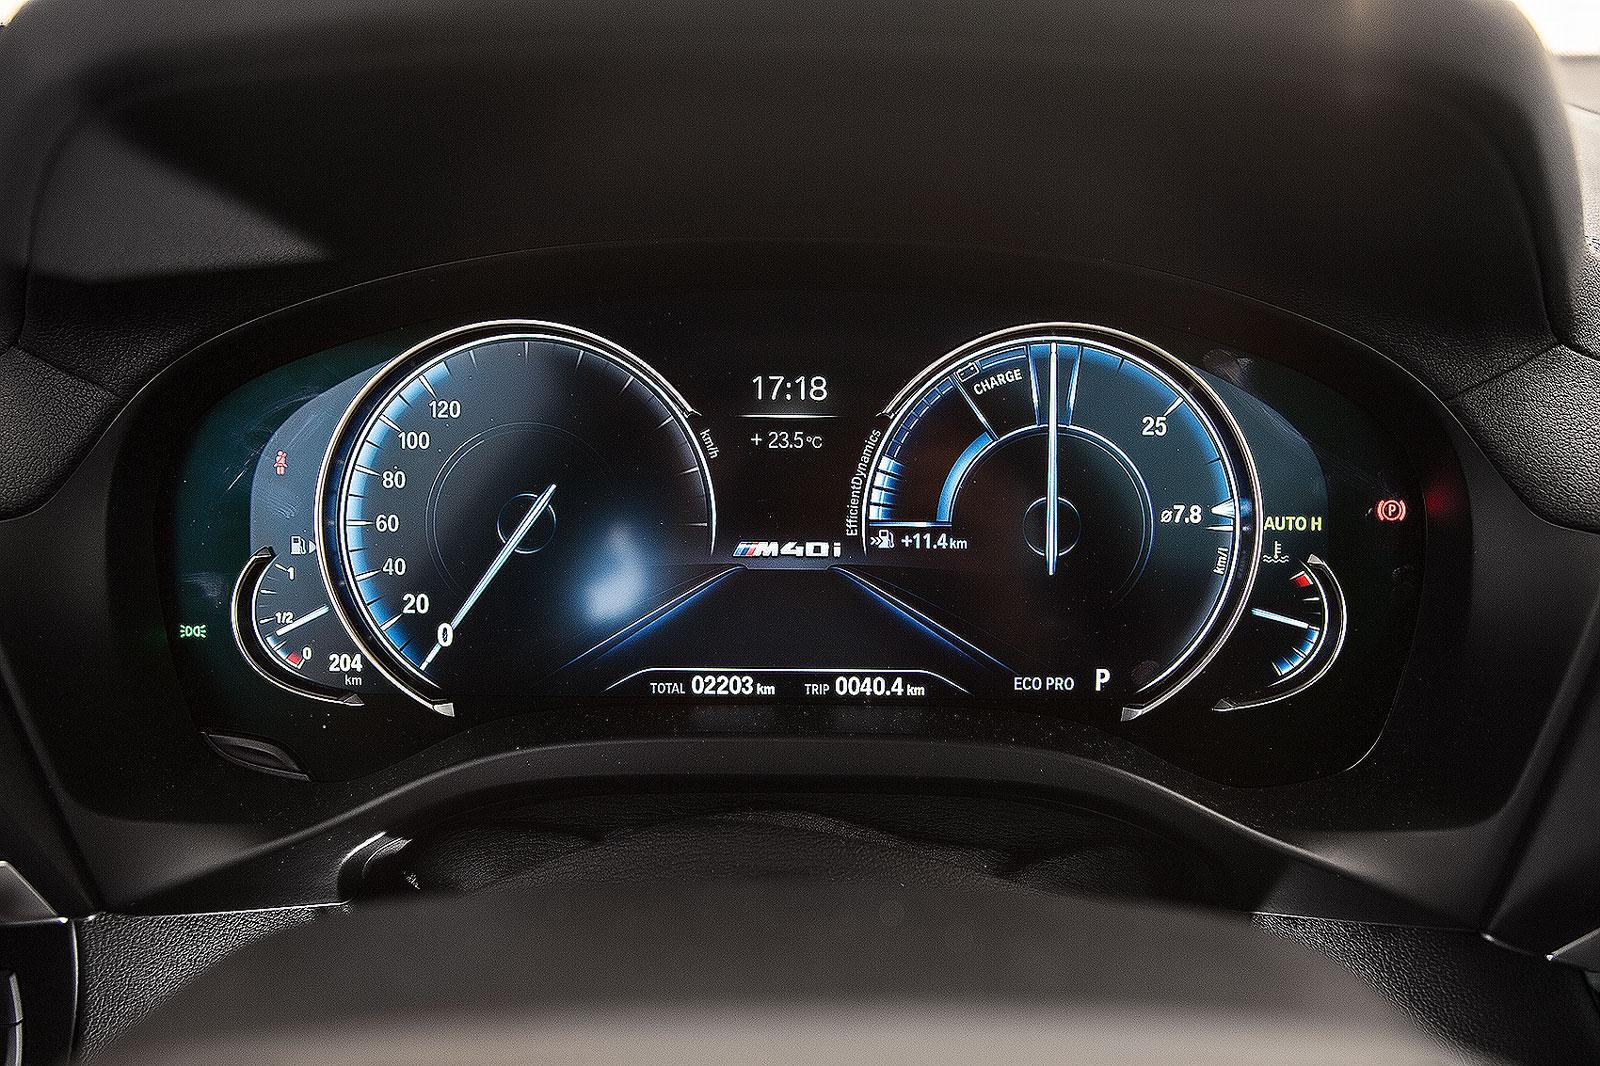 Velocímetro do BMW X3